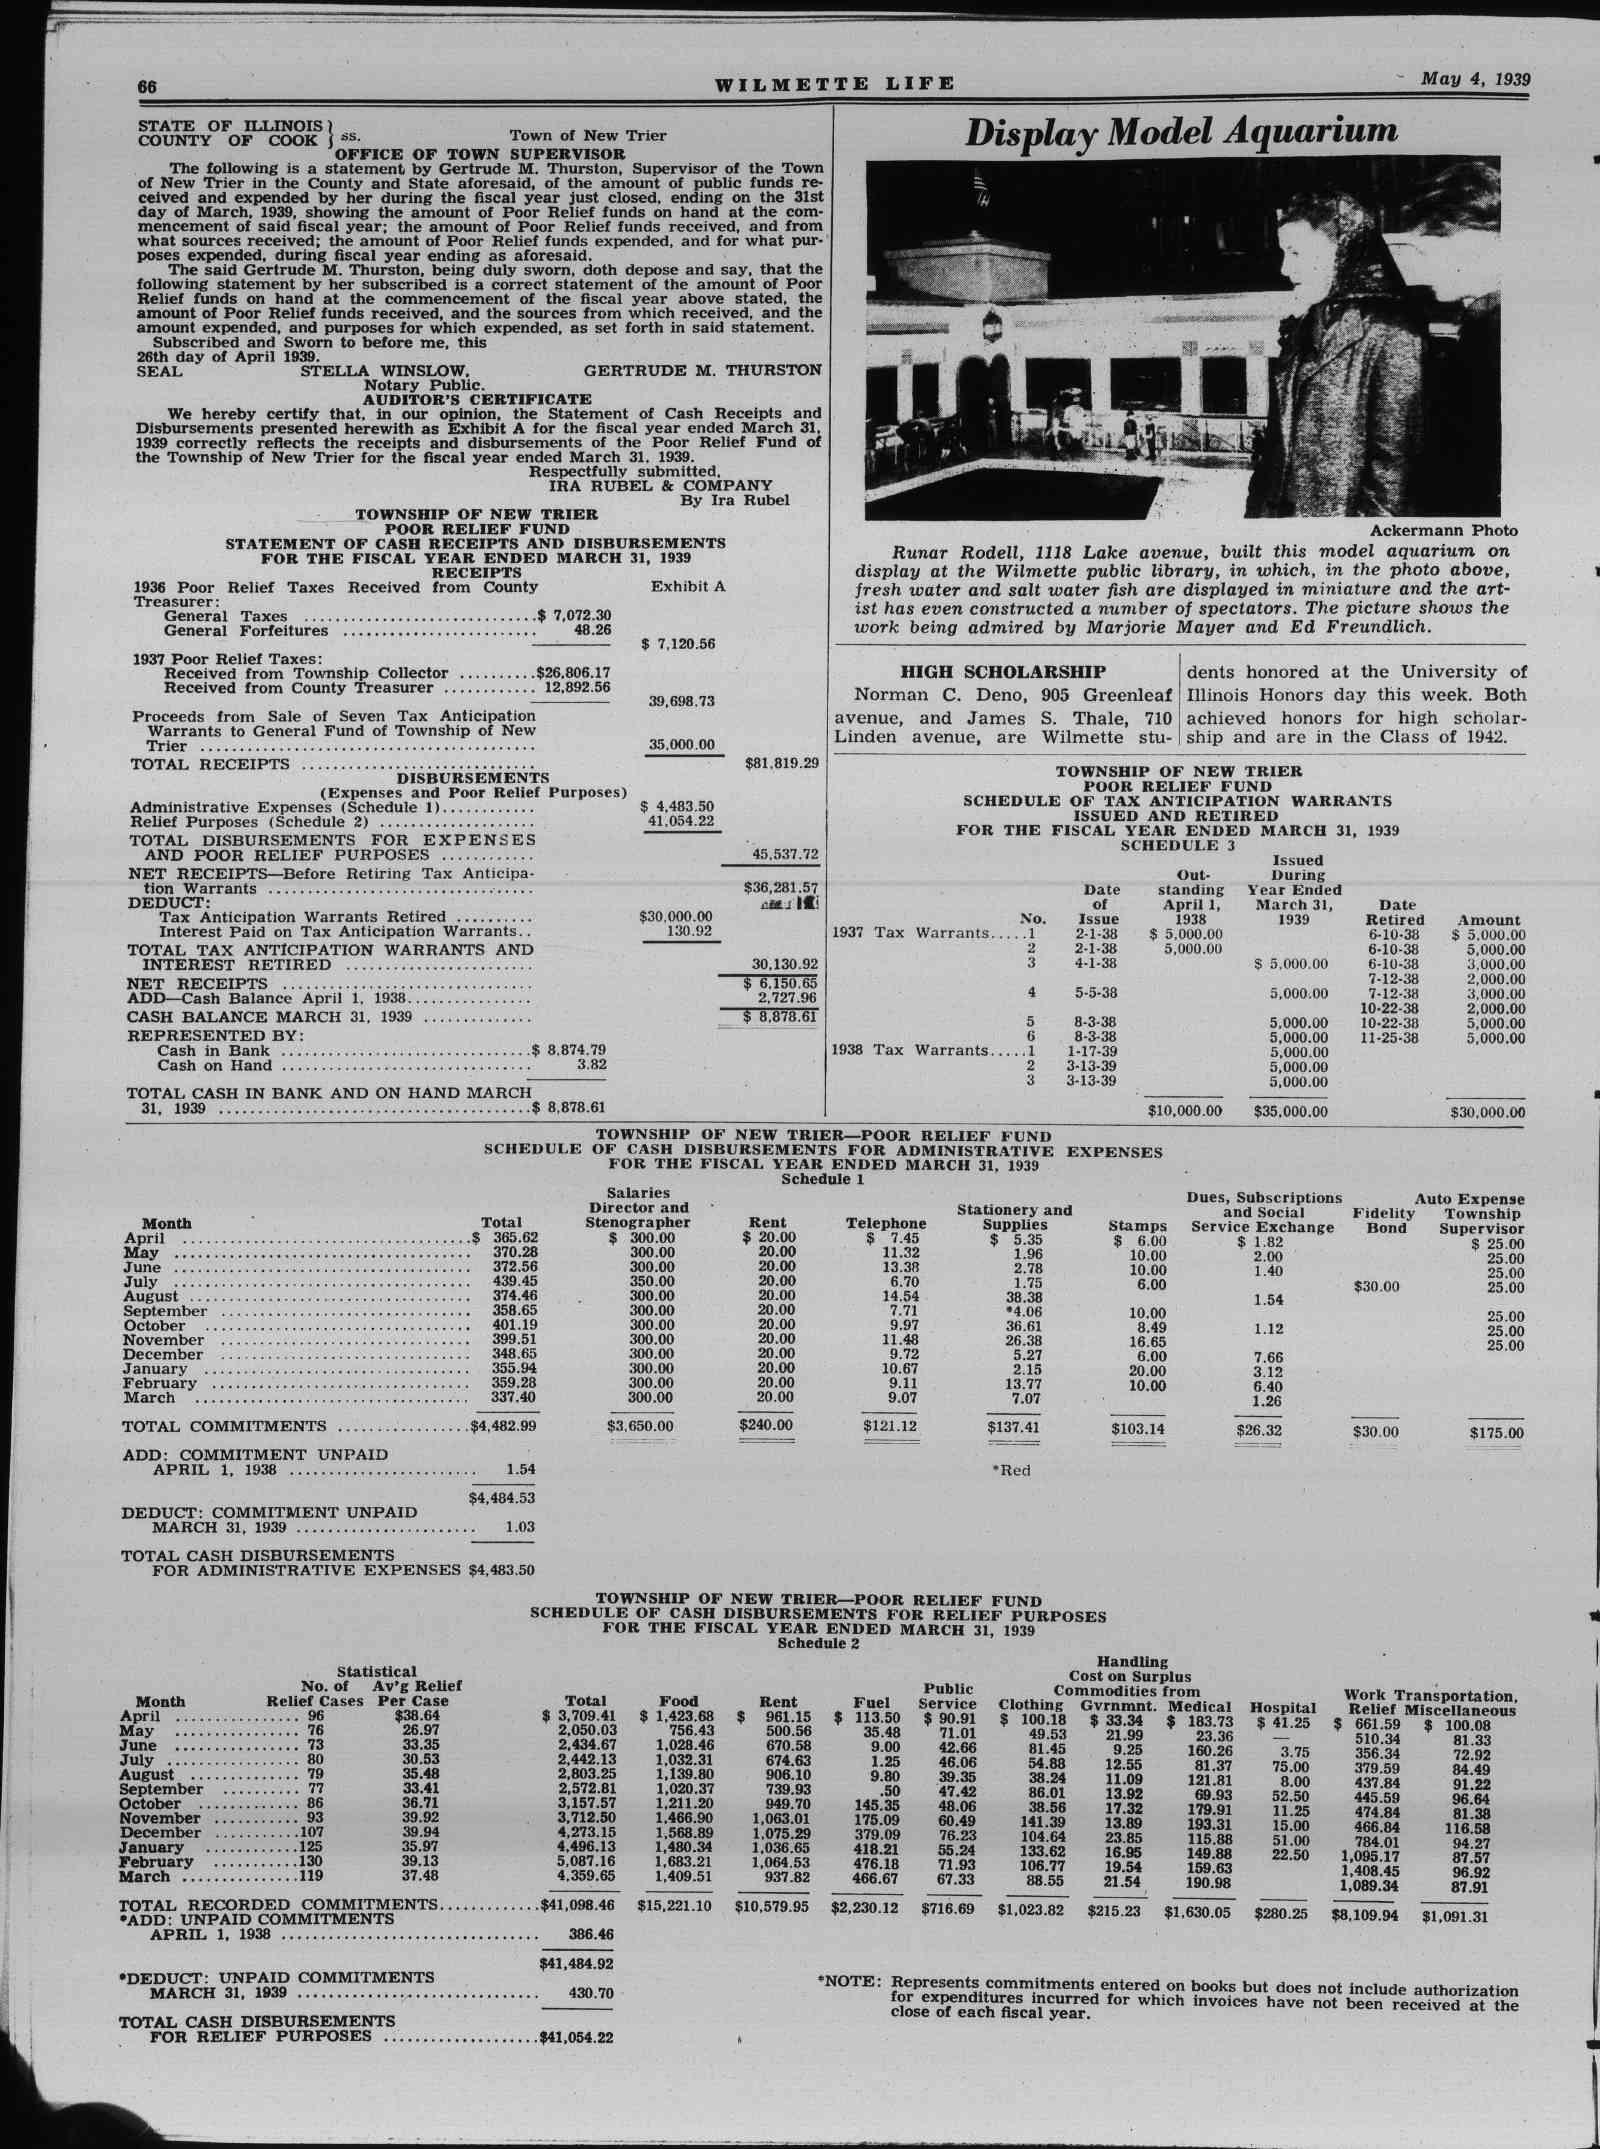 Wilmette Life (Wilmette, Illinois), 4 May 1939